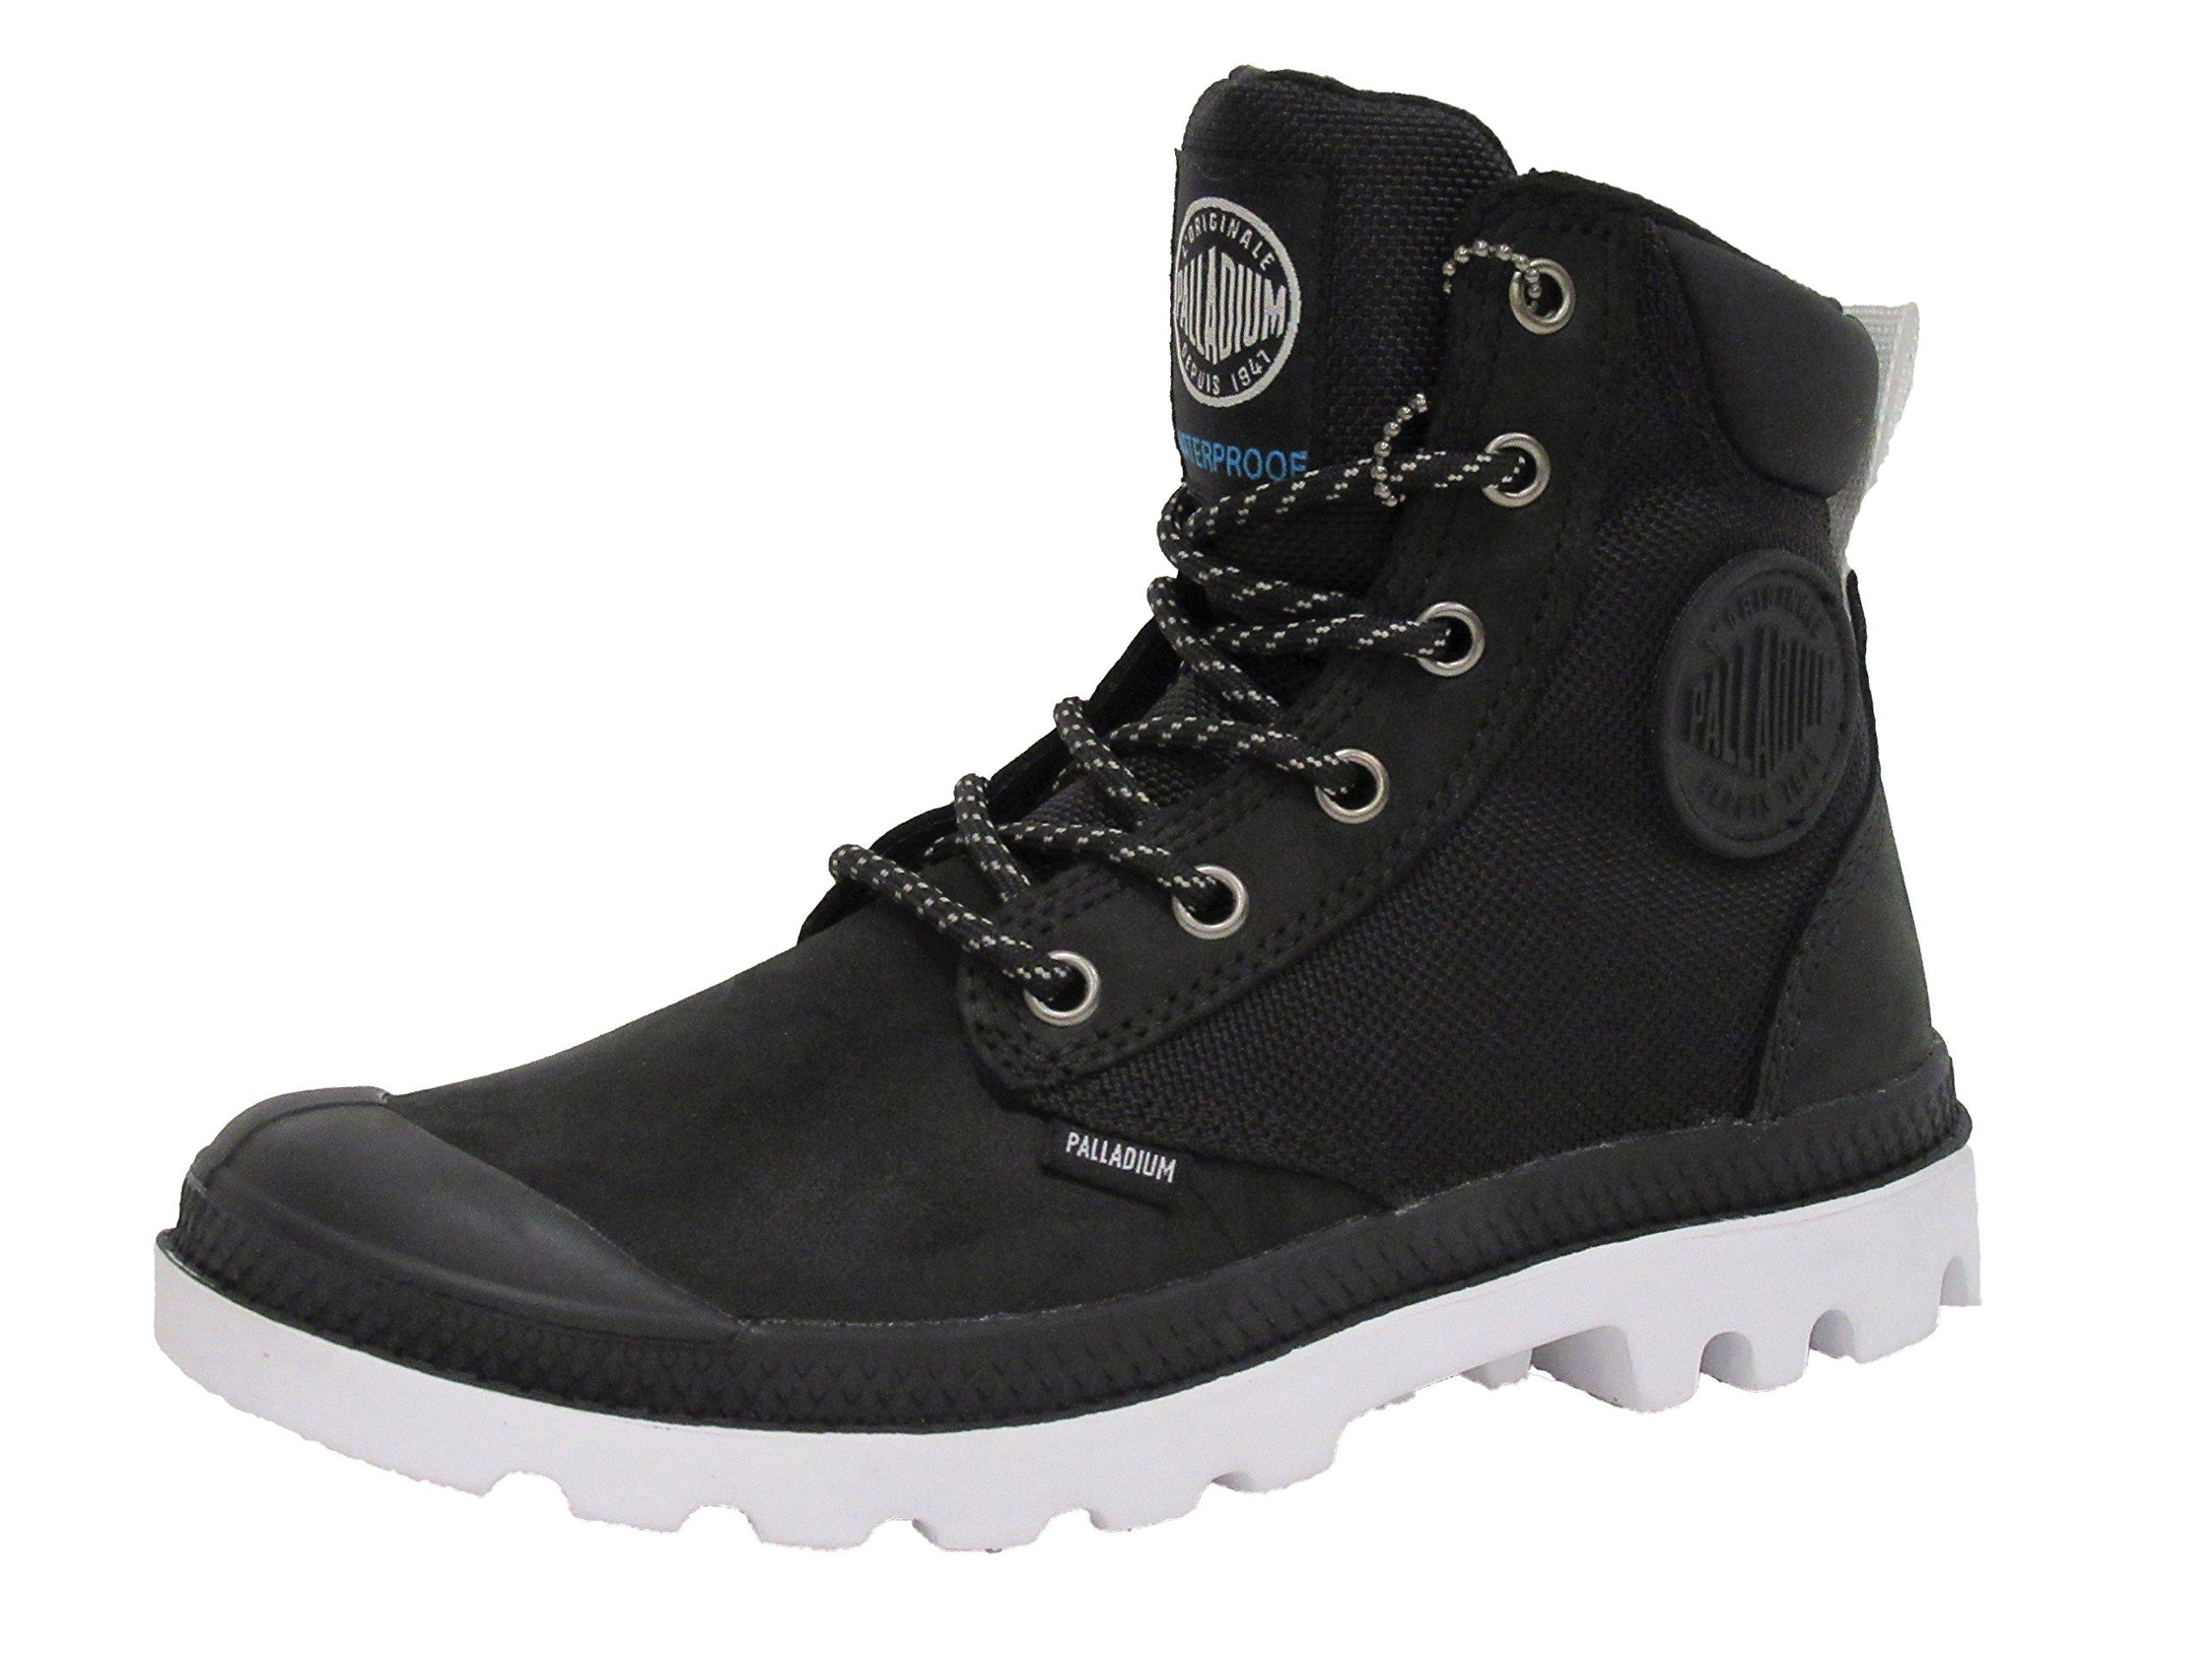 Palladium Boots Pampa Sport Cuff Wpn Waterproof Boots, Black/White, 3.5